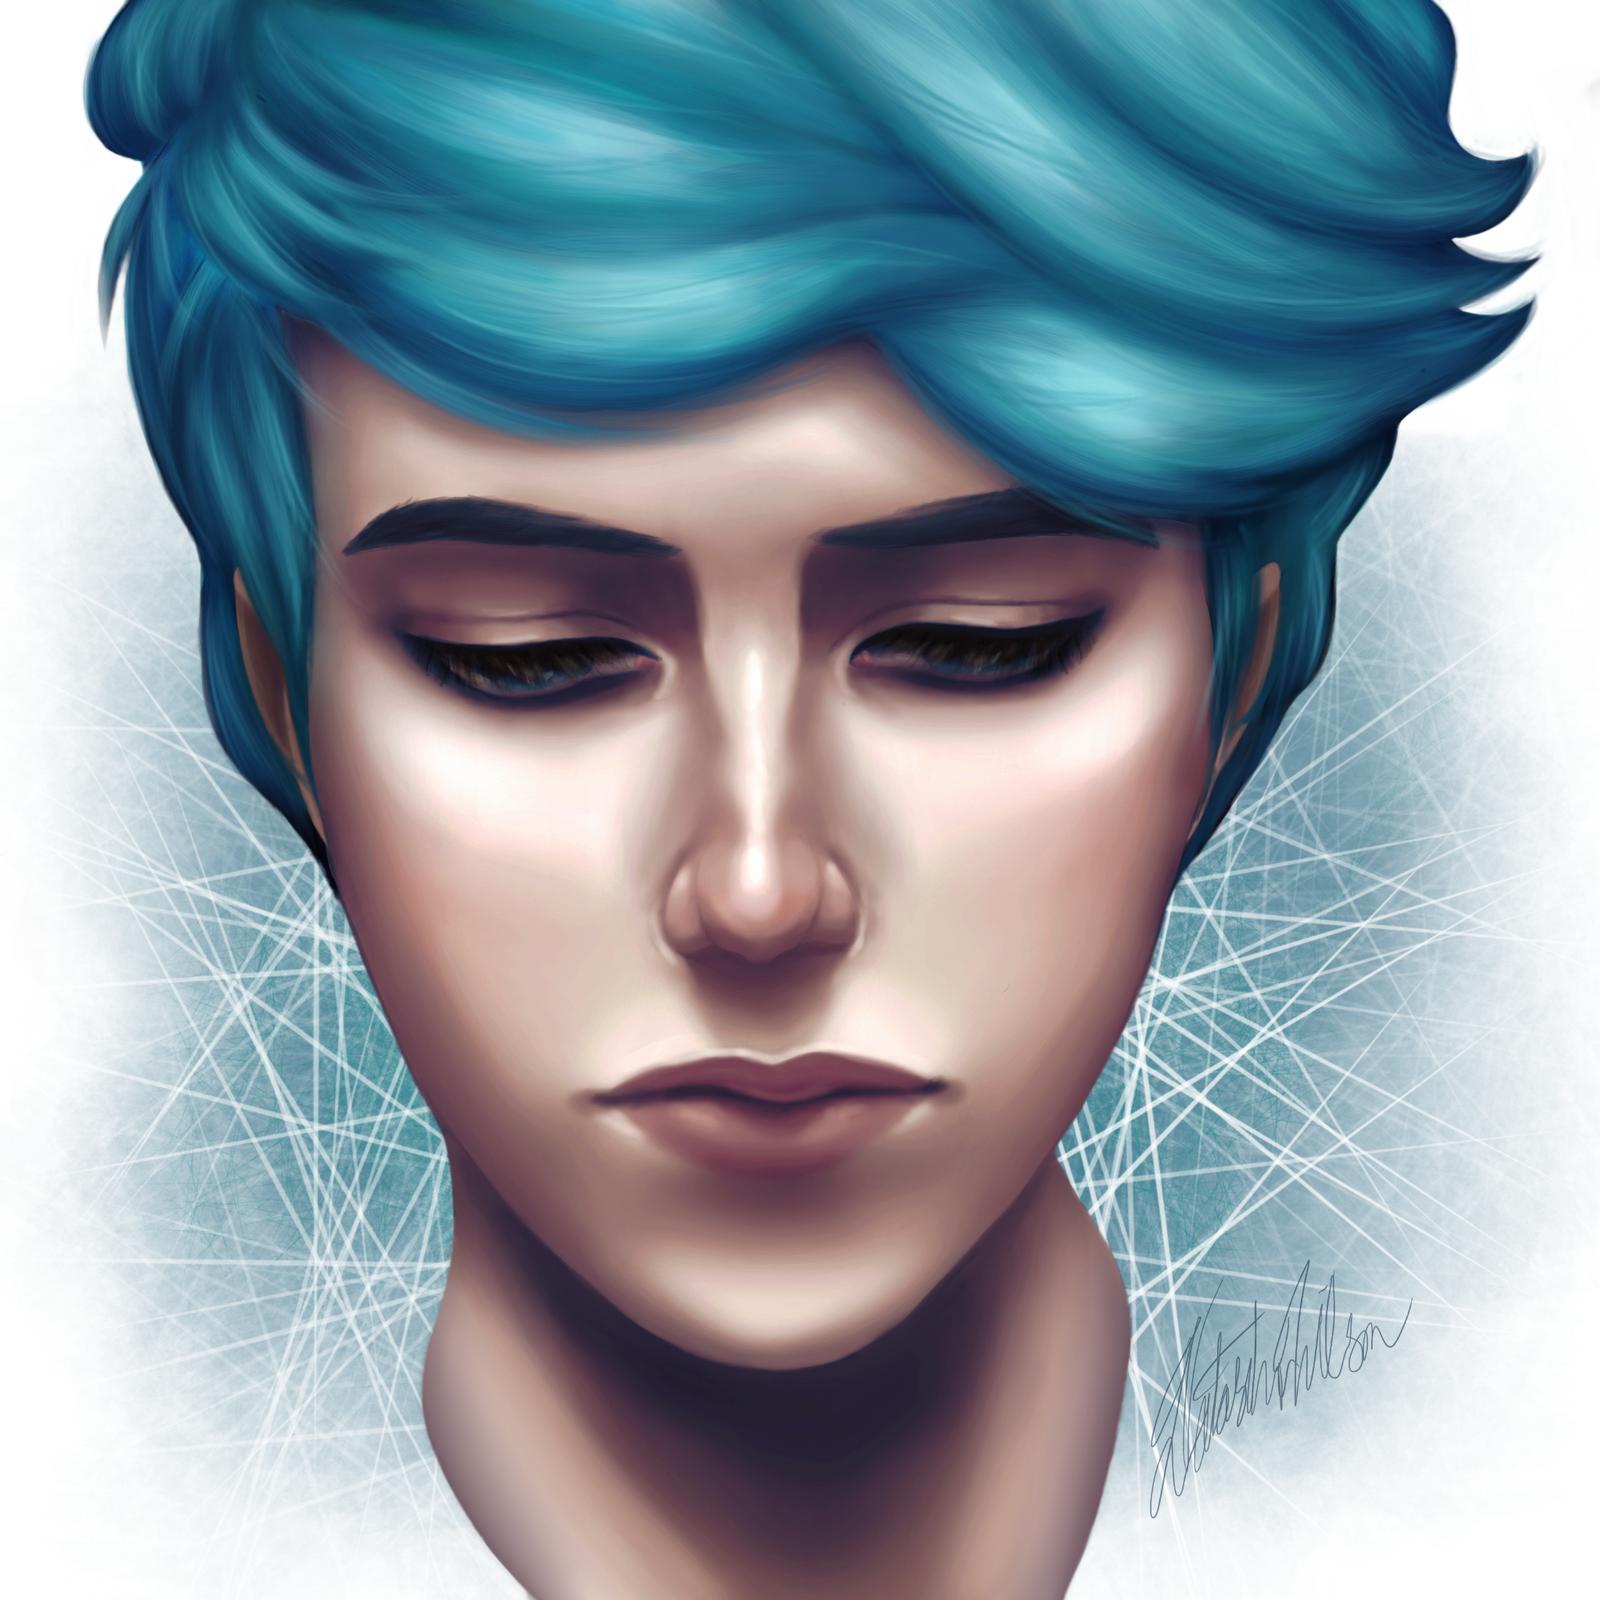 I'm Blue by Aurabeli